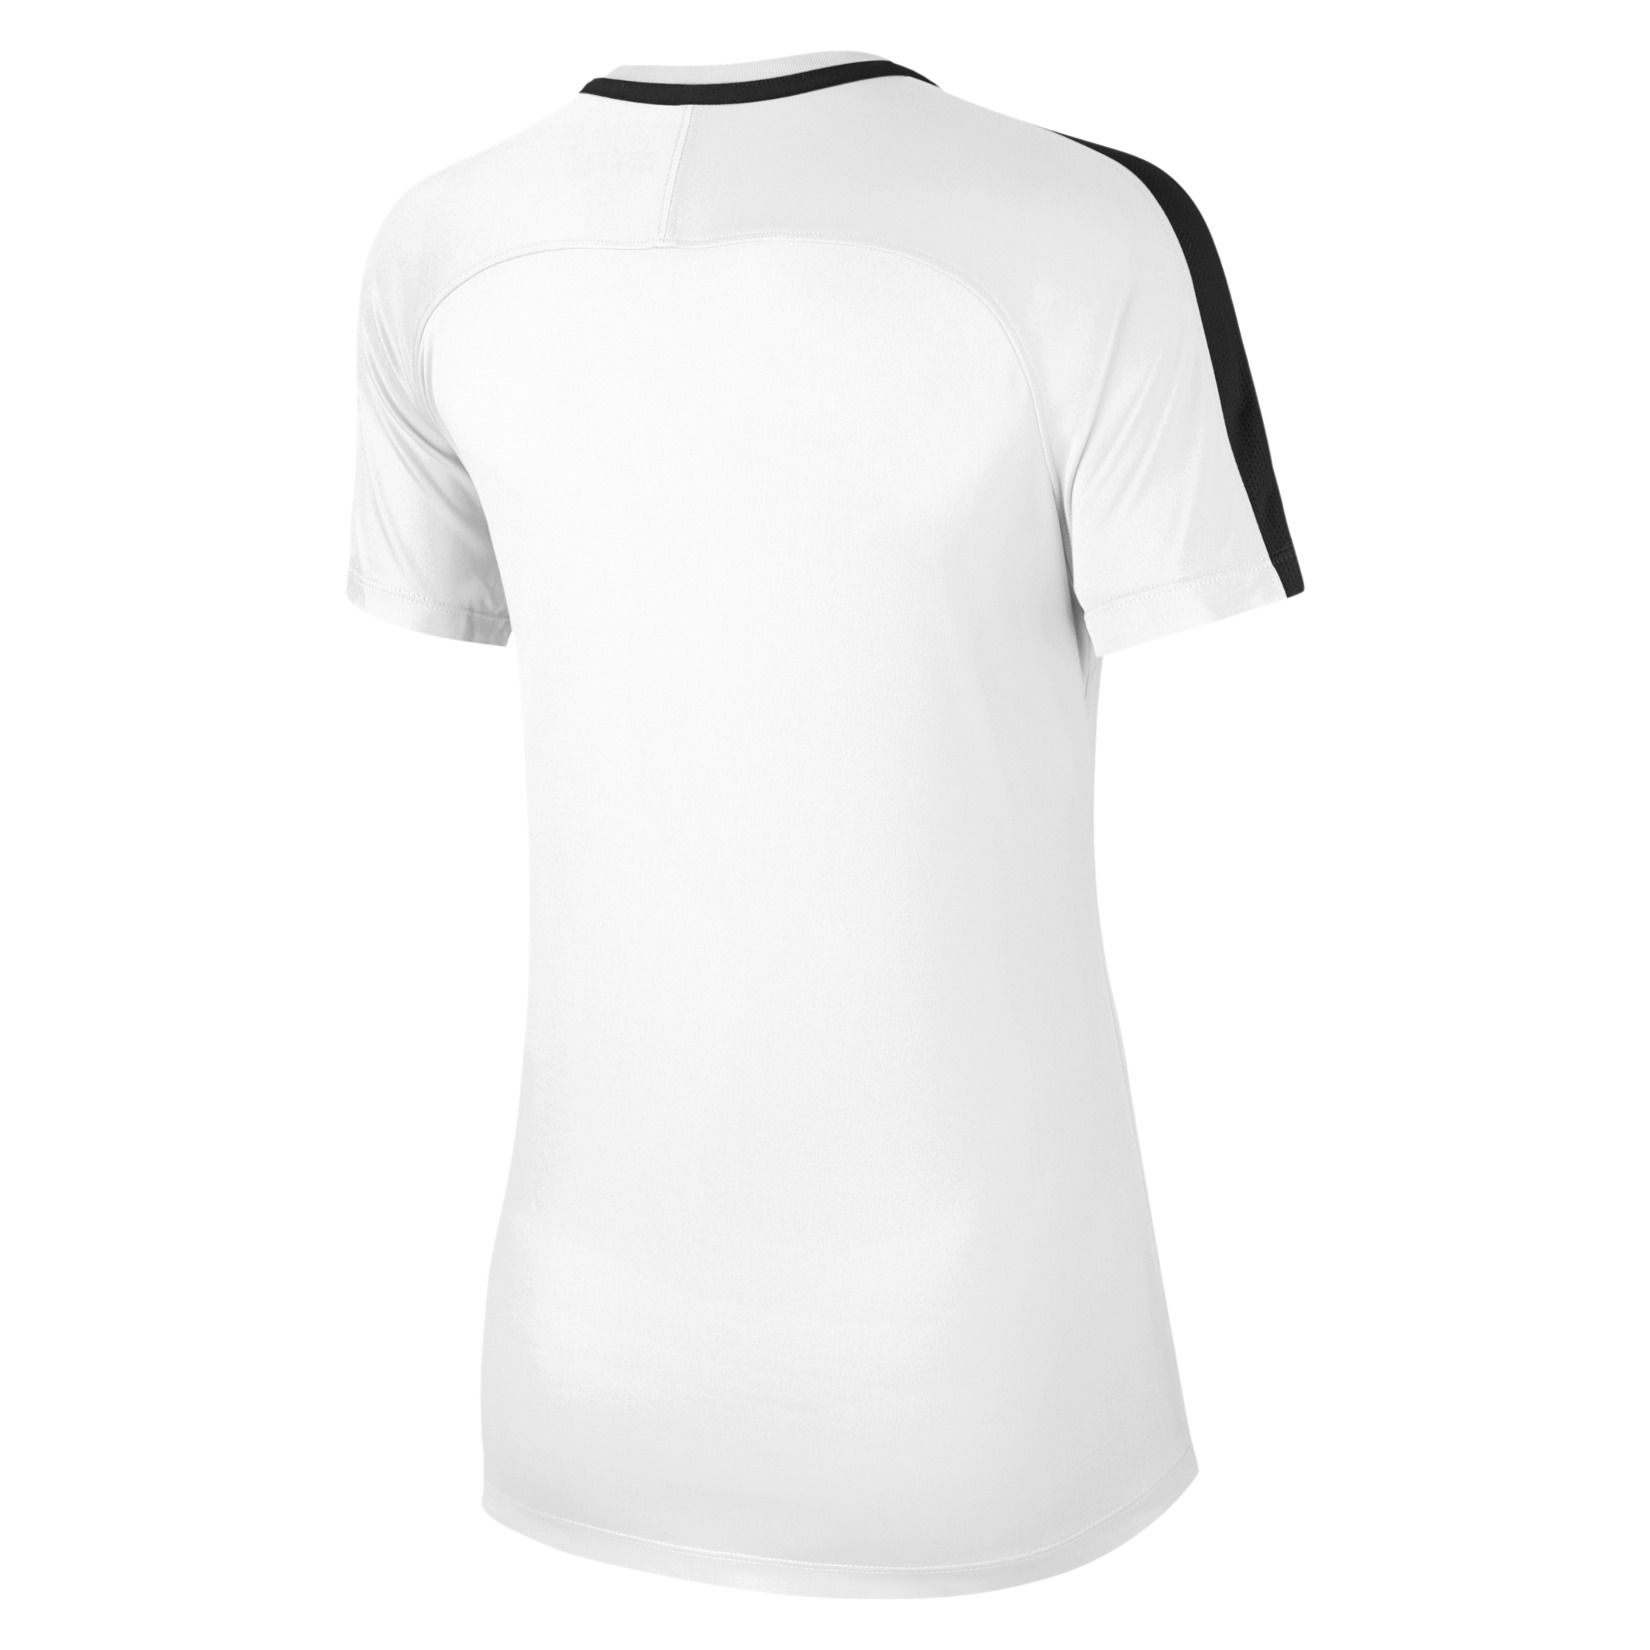 04b4f2ef0 MN Sport - Koszulka treningowa Nike ACADEMY 18 Women TRAINING TOP ...